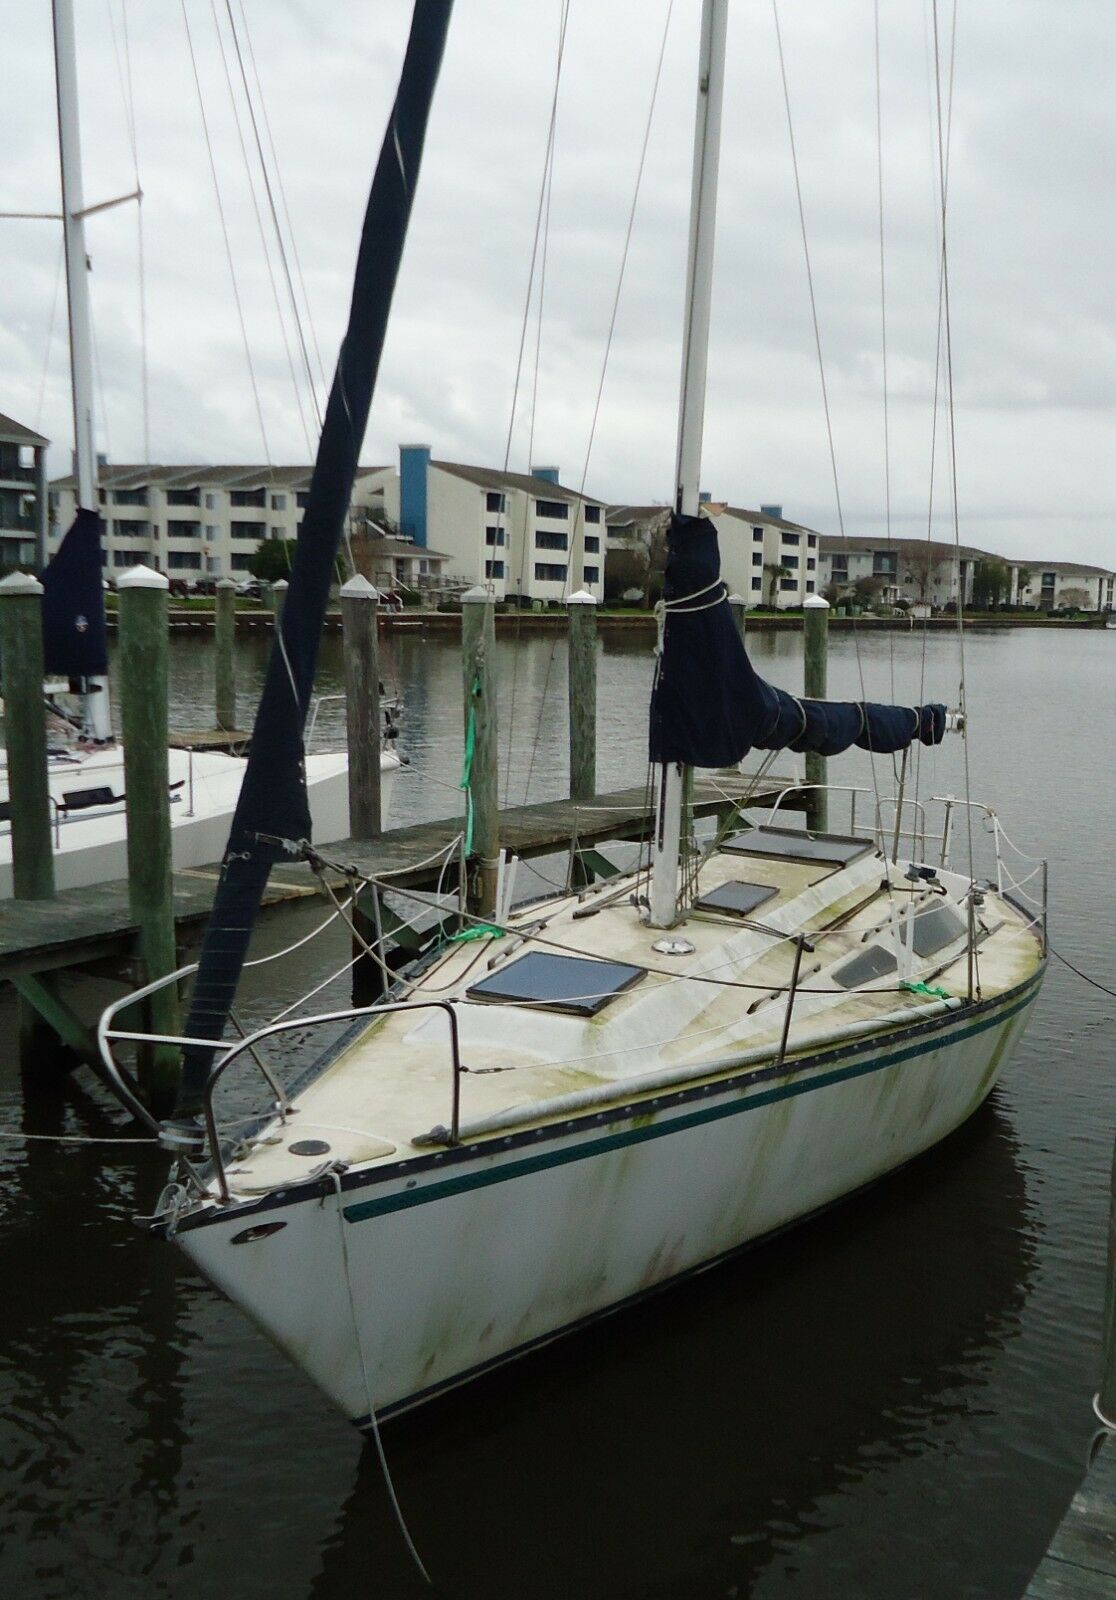 1979 Seidelmann 299 30' Sailboat - Louisiana